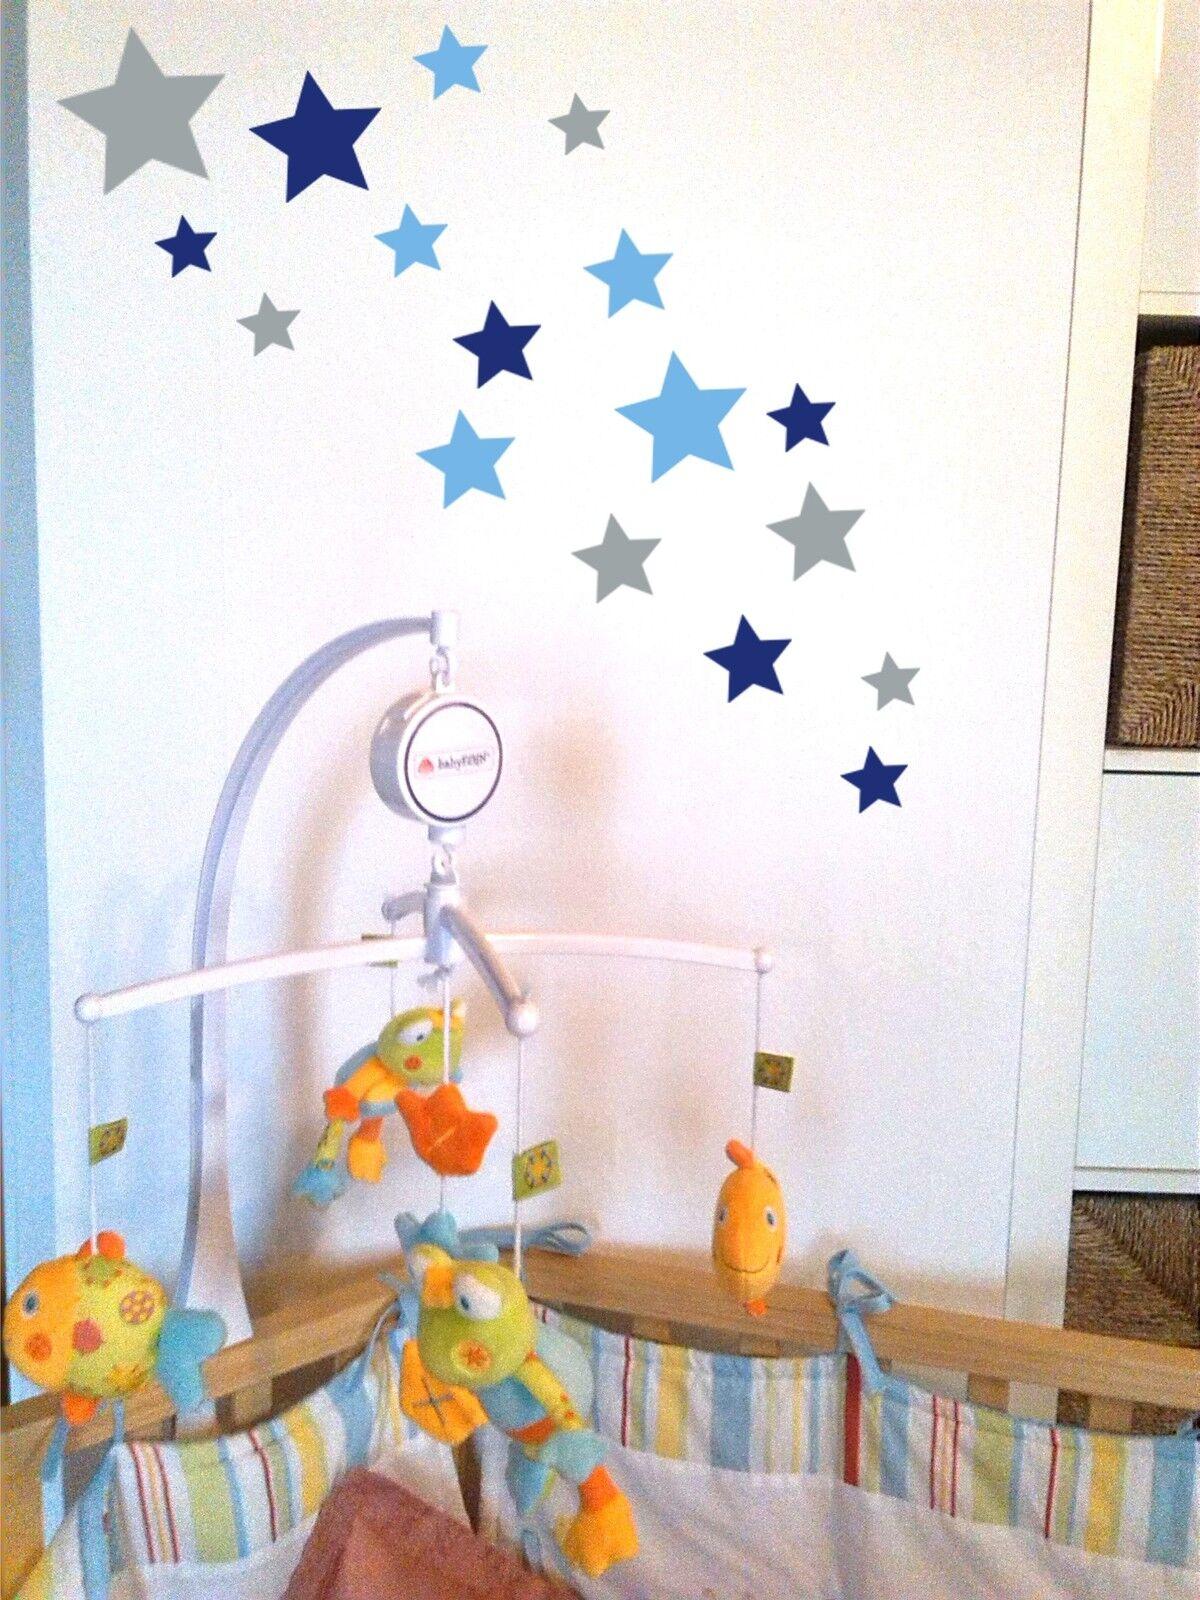 18 Kinder Sterne Aufkleber Mix Set Silber/Blau/Hellblau; Wandtattoo,Fensterbild